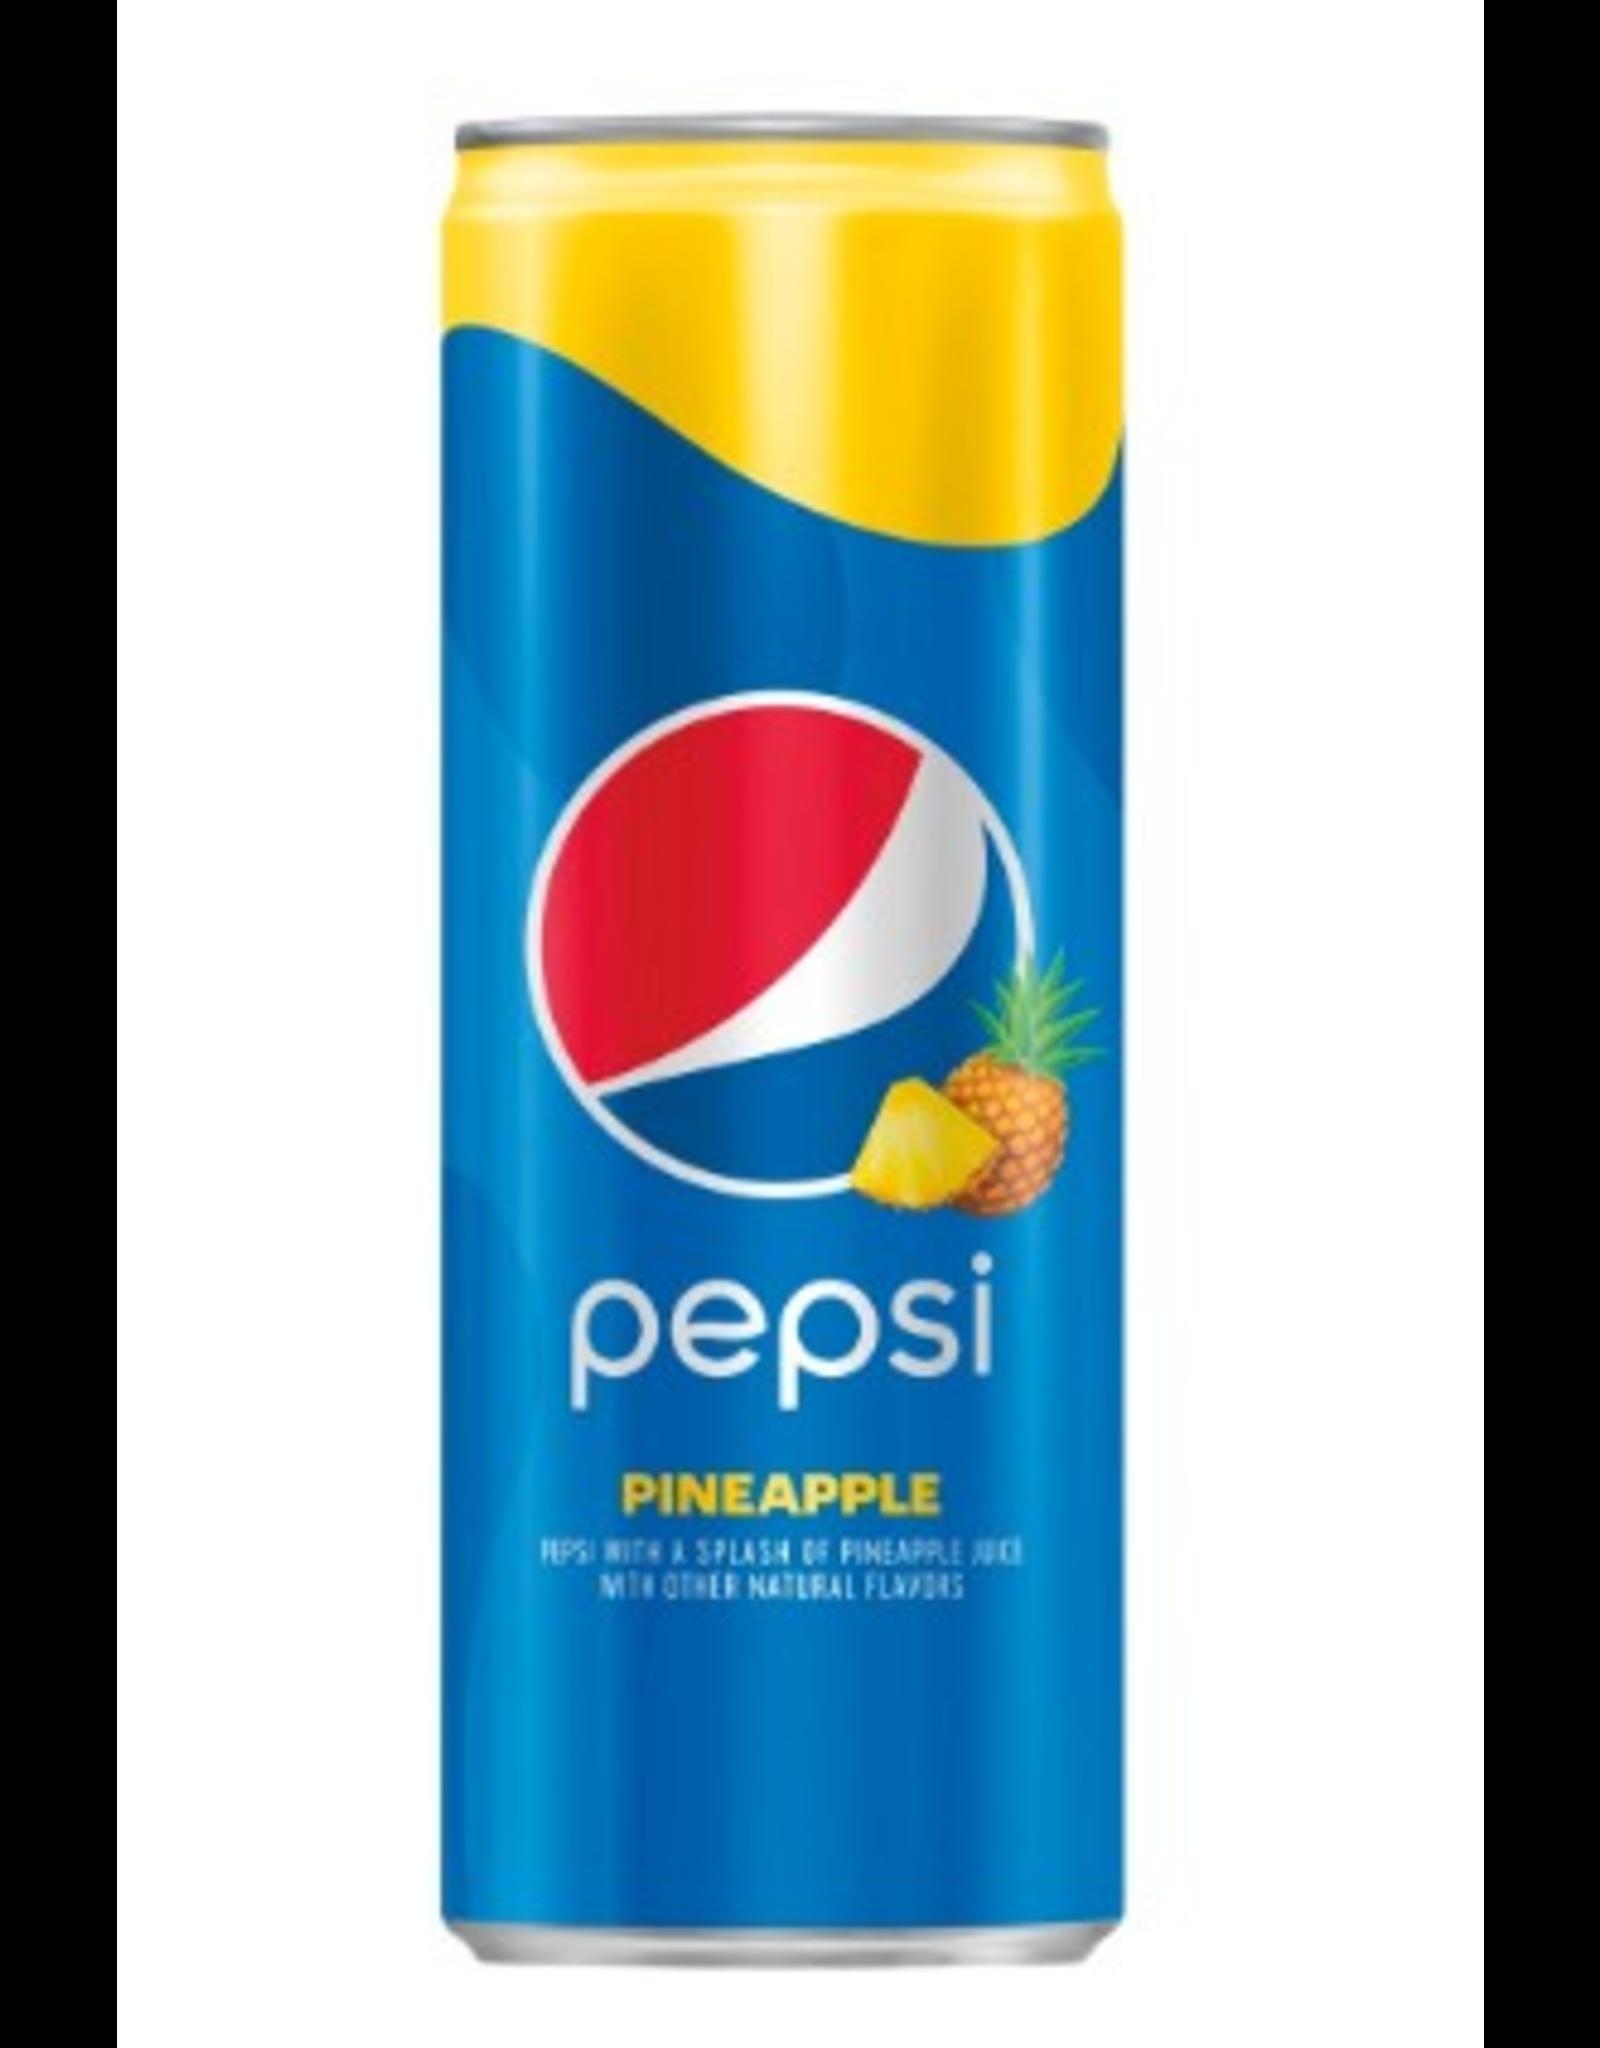 Pepsi Pineapple - 355ml